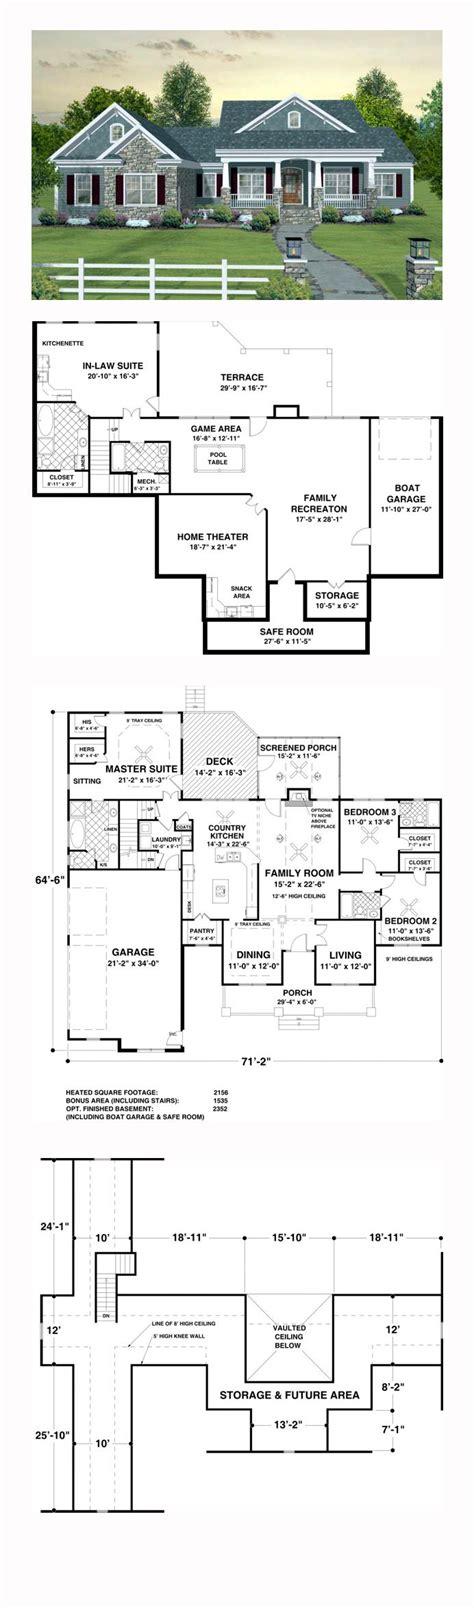 amazing floor plans 17 amazing basement apartment floor plans home design ideas